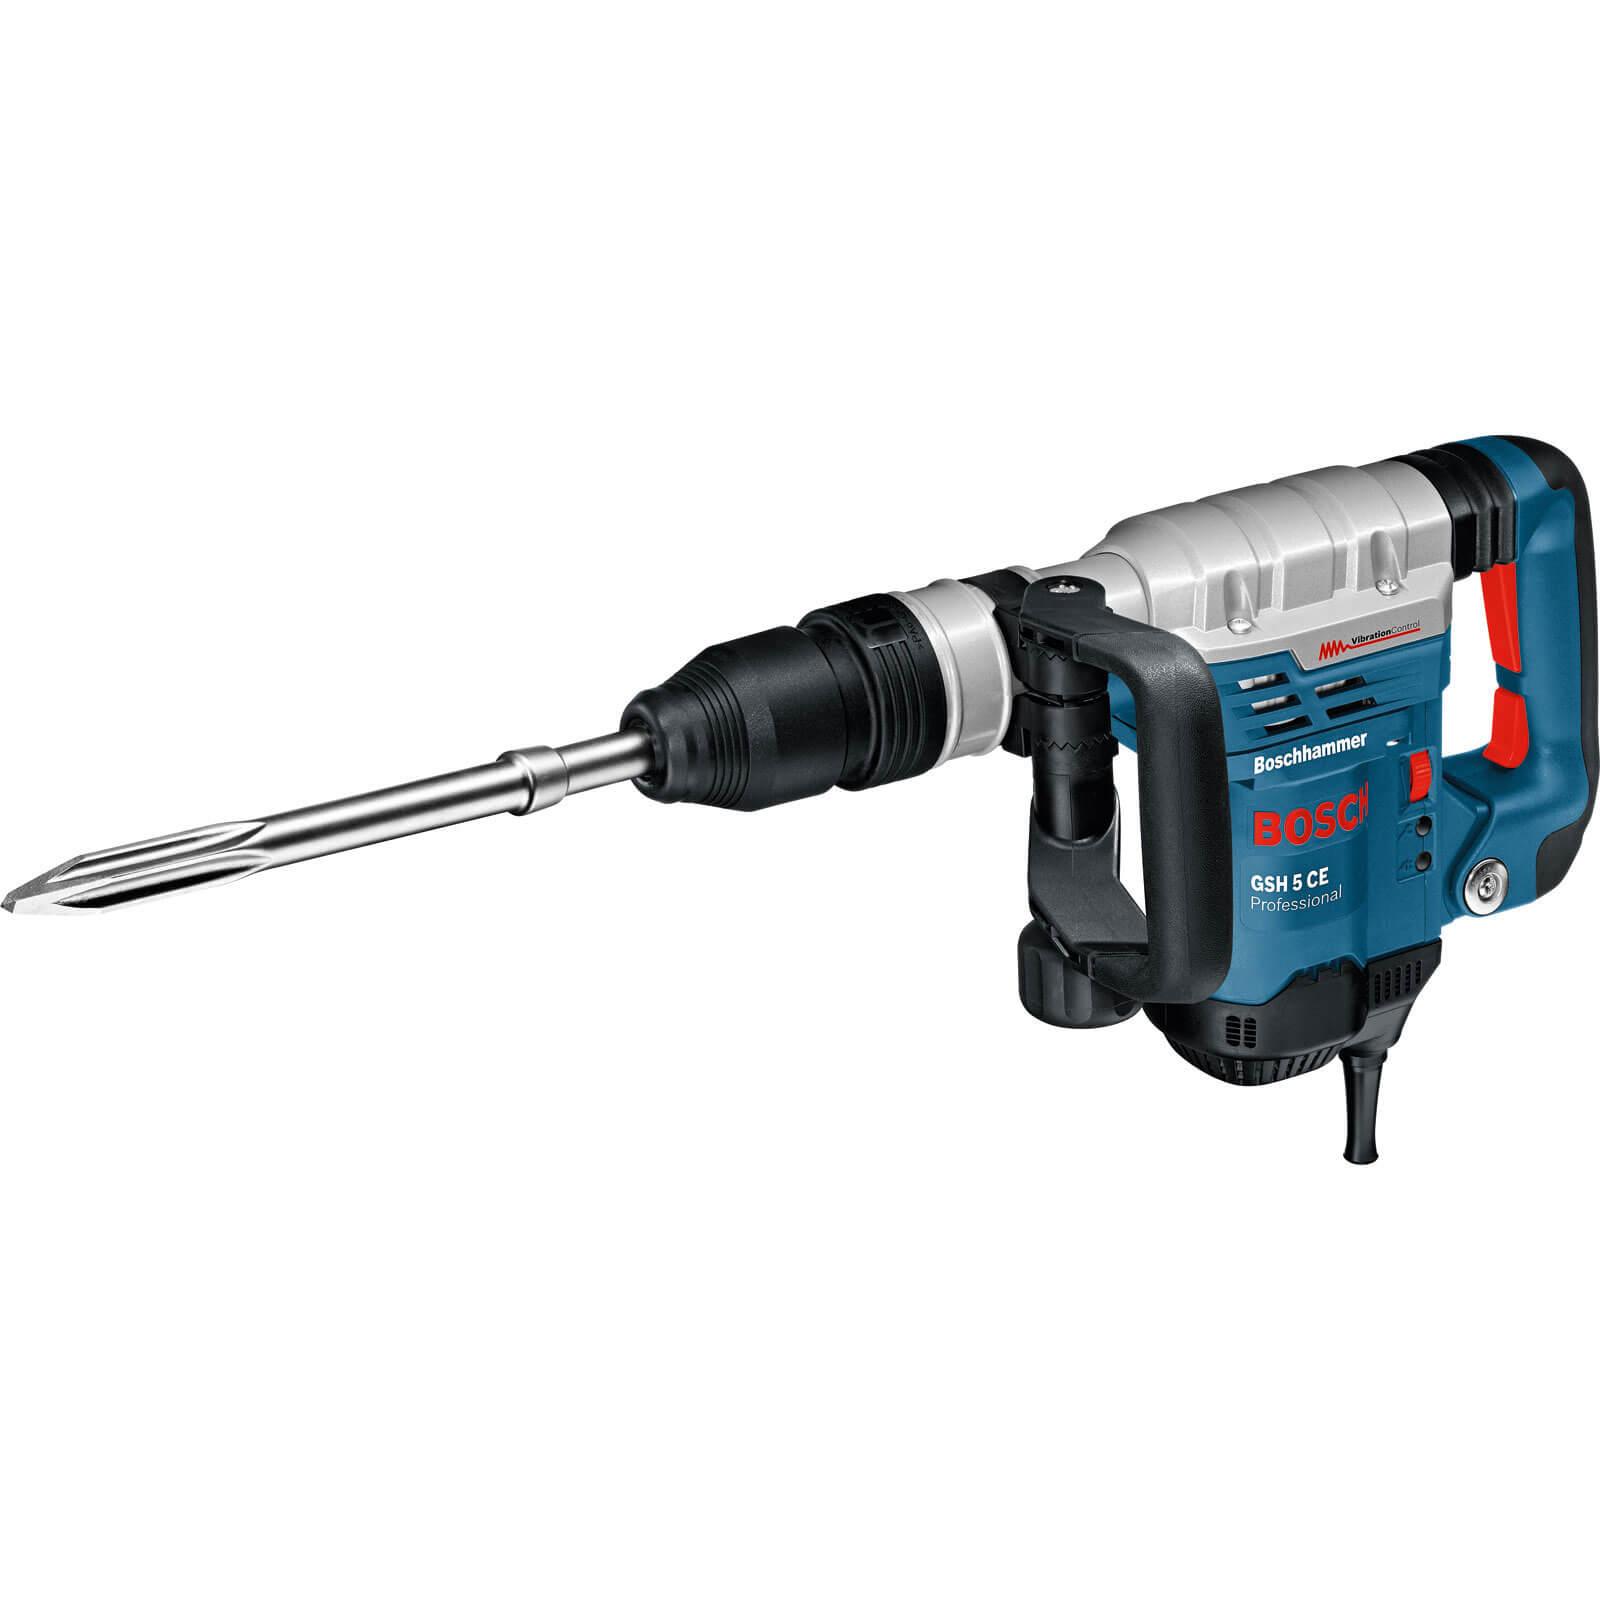 Image of Bosch GSH 5CE SDS Max Demolition Hammer 110v